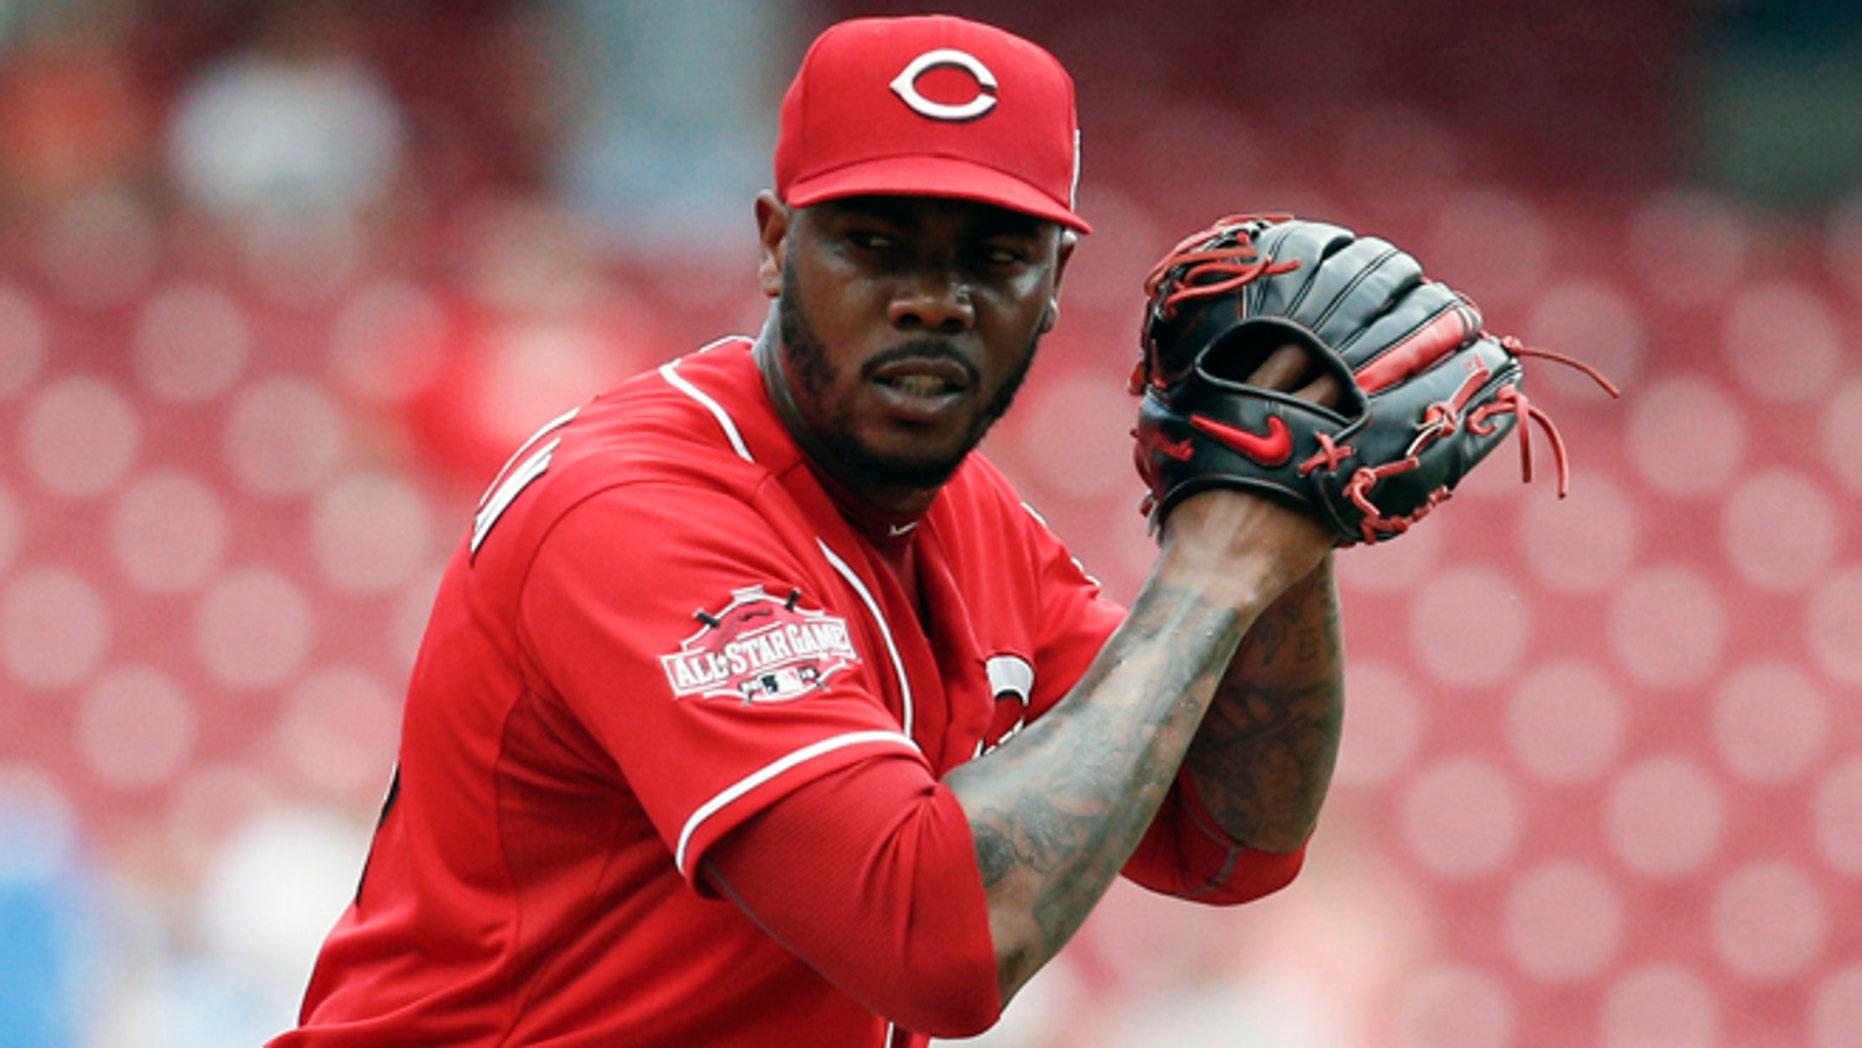 Cincinnati Reds relief pitcher Aroldis Chapman on Monday, Sept. 7, 2015.